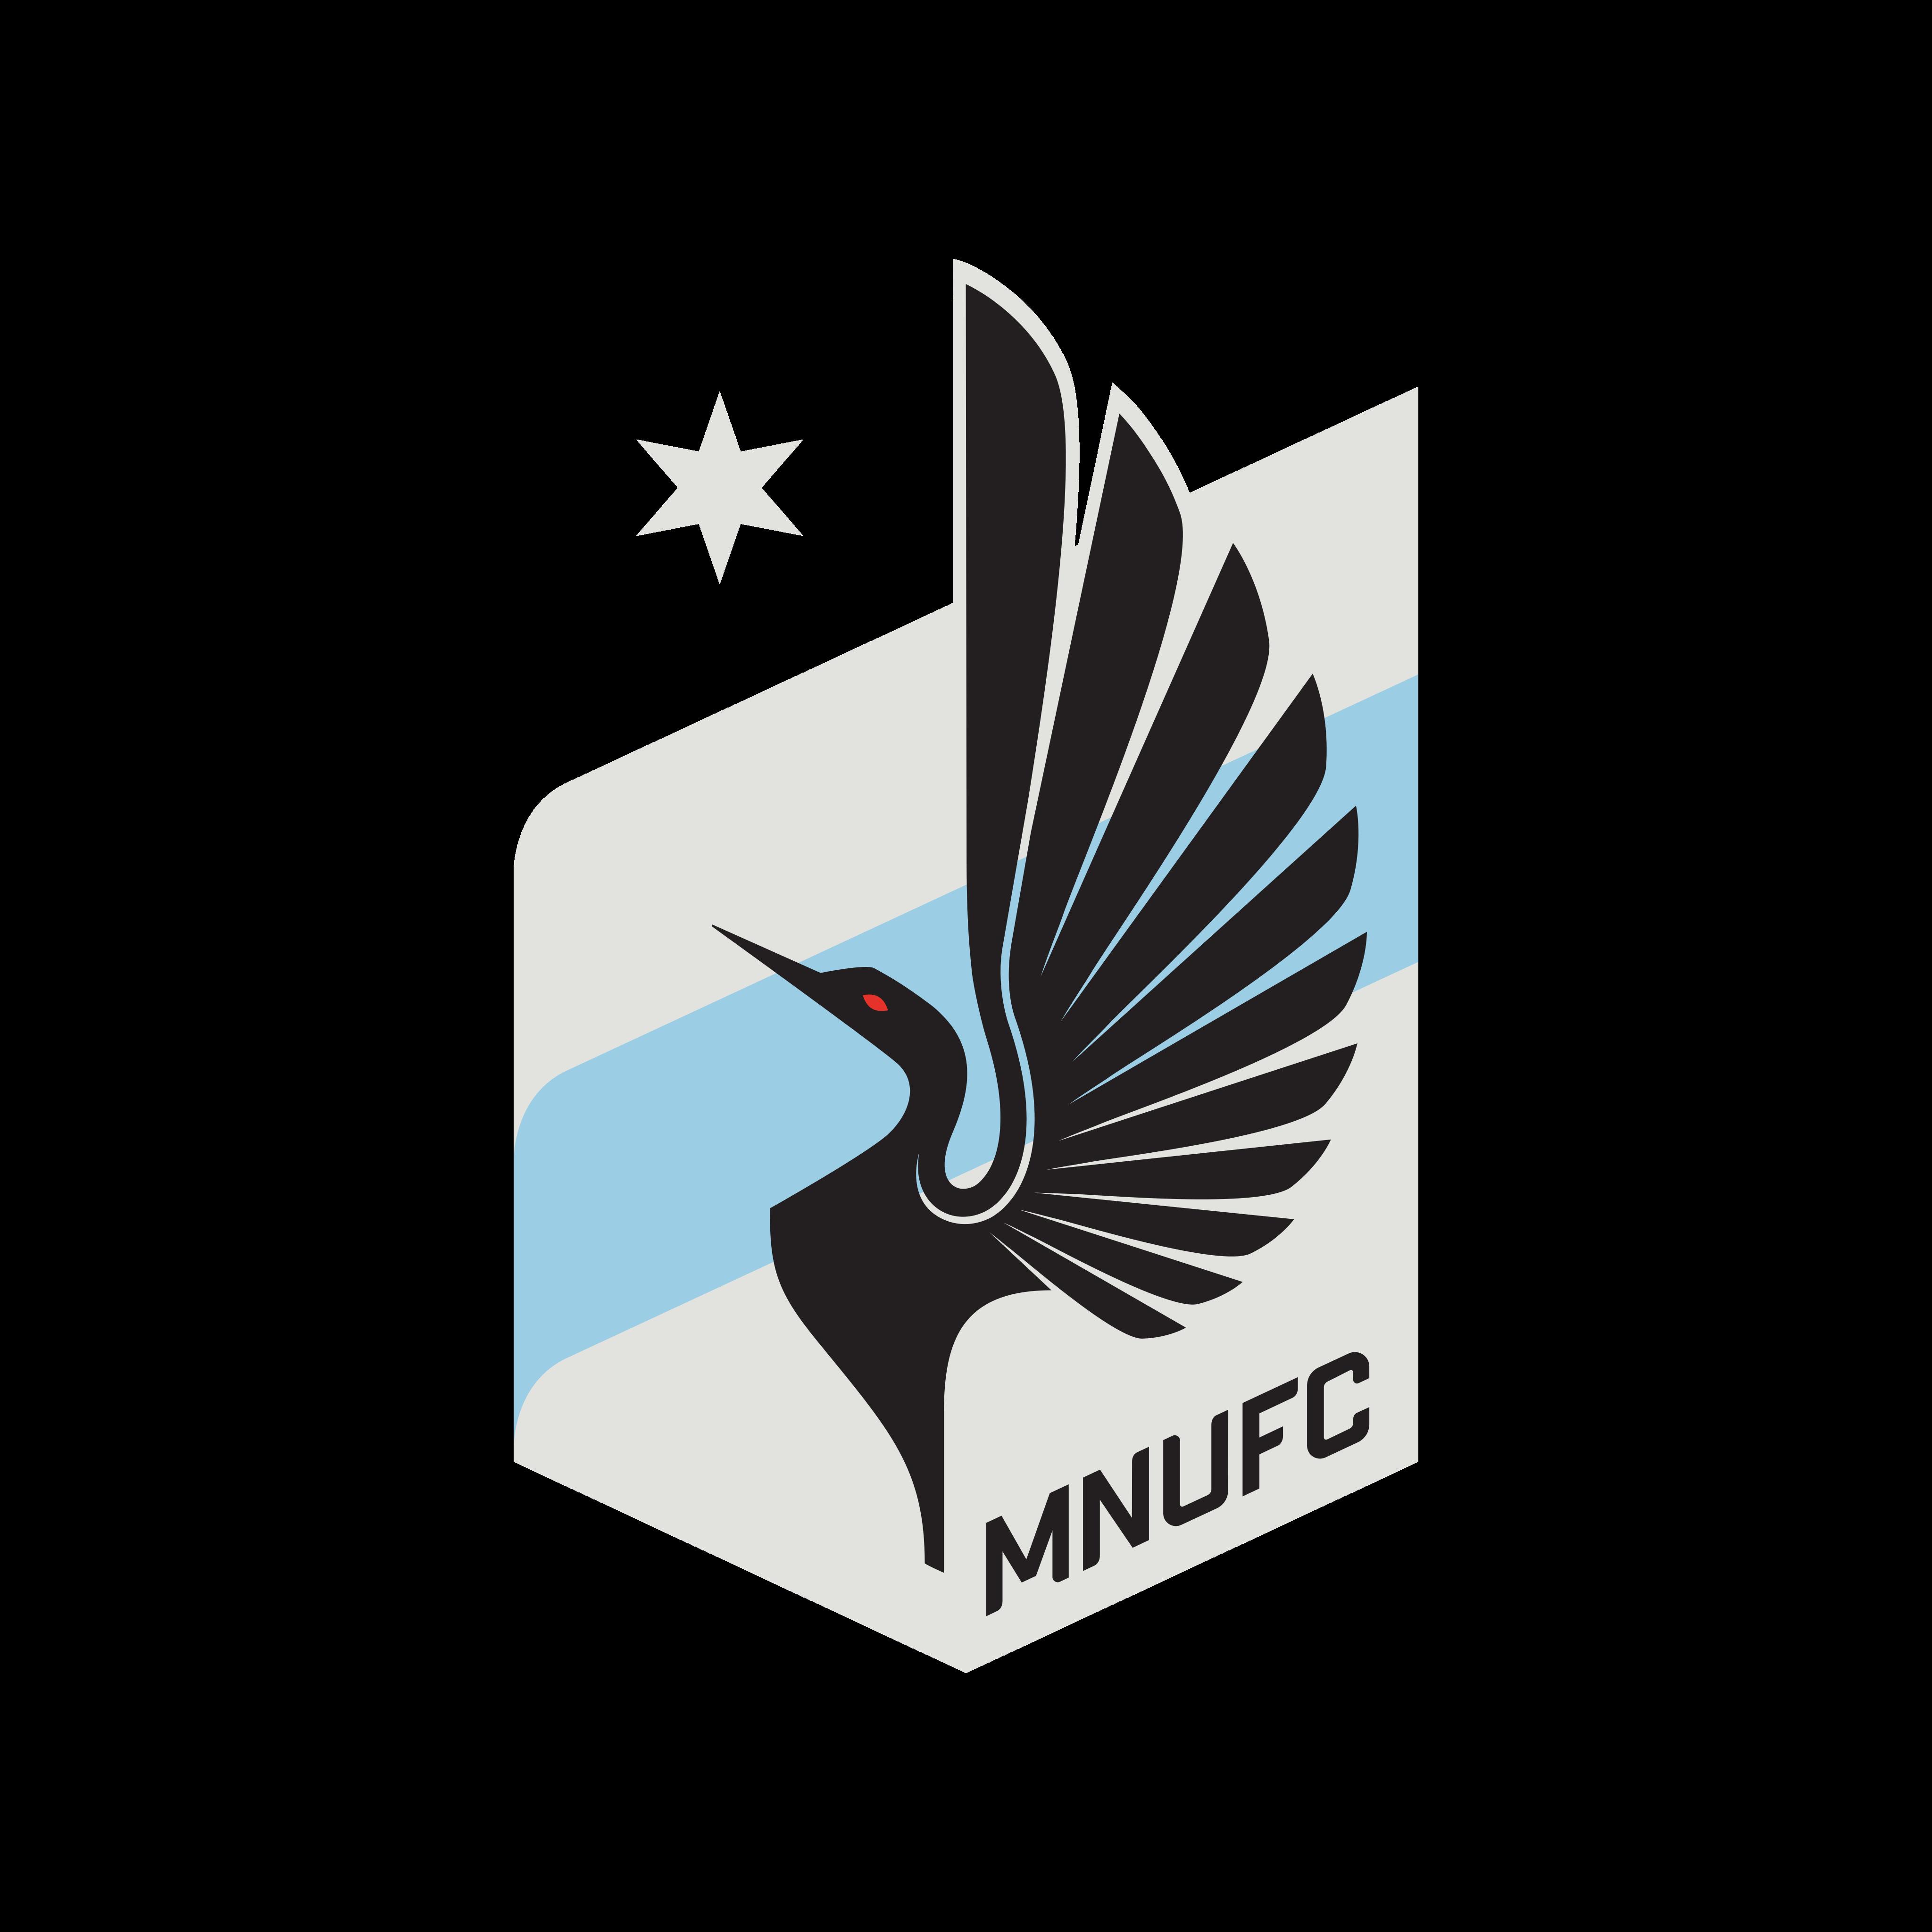 minnesota united fc logo 0 - Minnesota United FC Logo